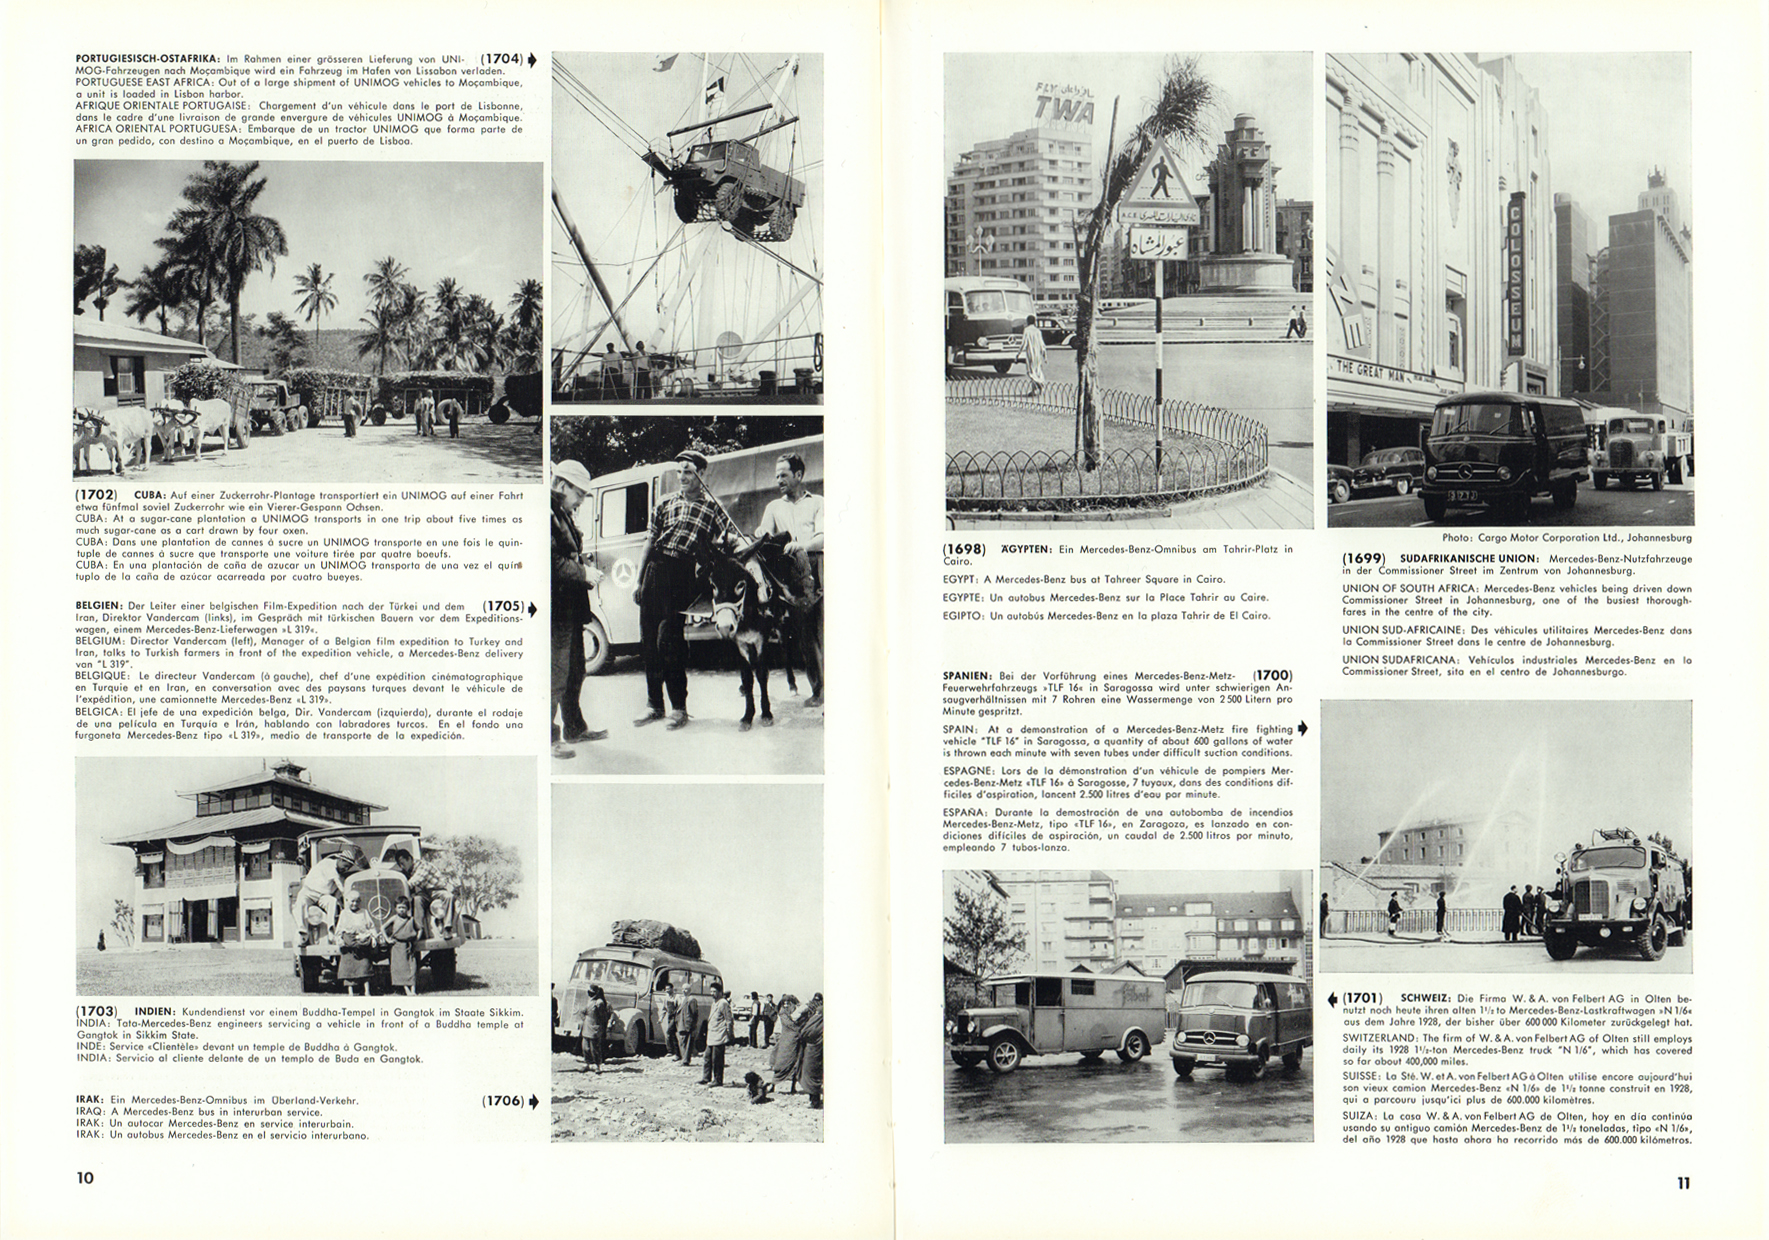 (REVISTA): Periódico In aller welt n.º 12 - Mercedes-Benz no mundo - 1957 - multilingue 006